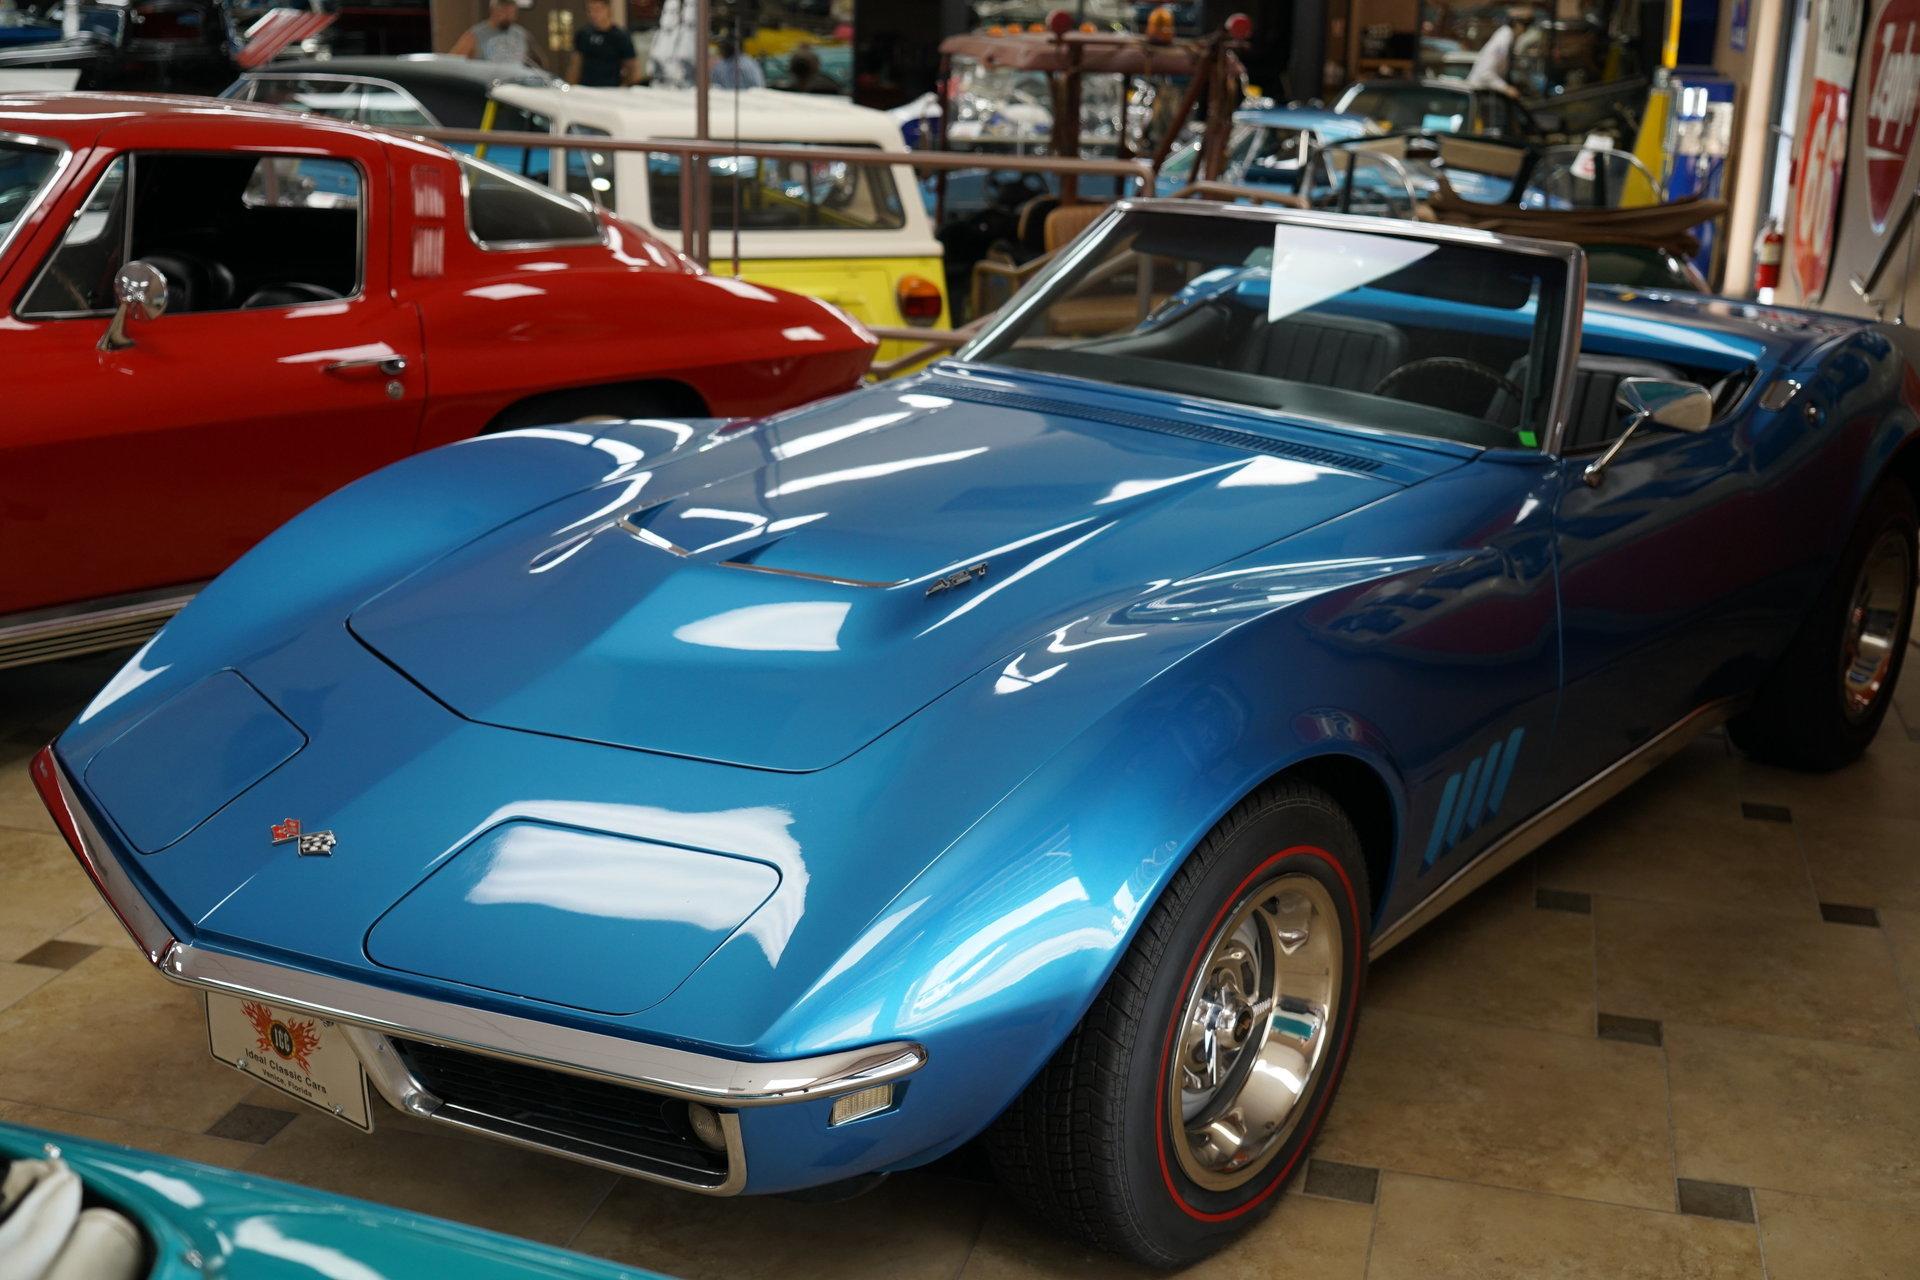 Chevrolet Corvette Ideal Classic Cars LLC - Ideal classic cars car show